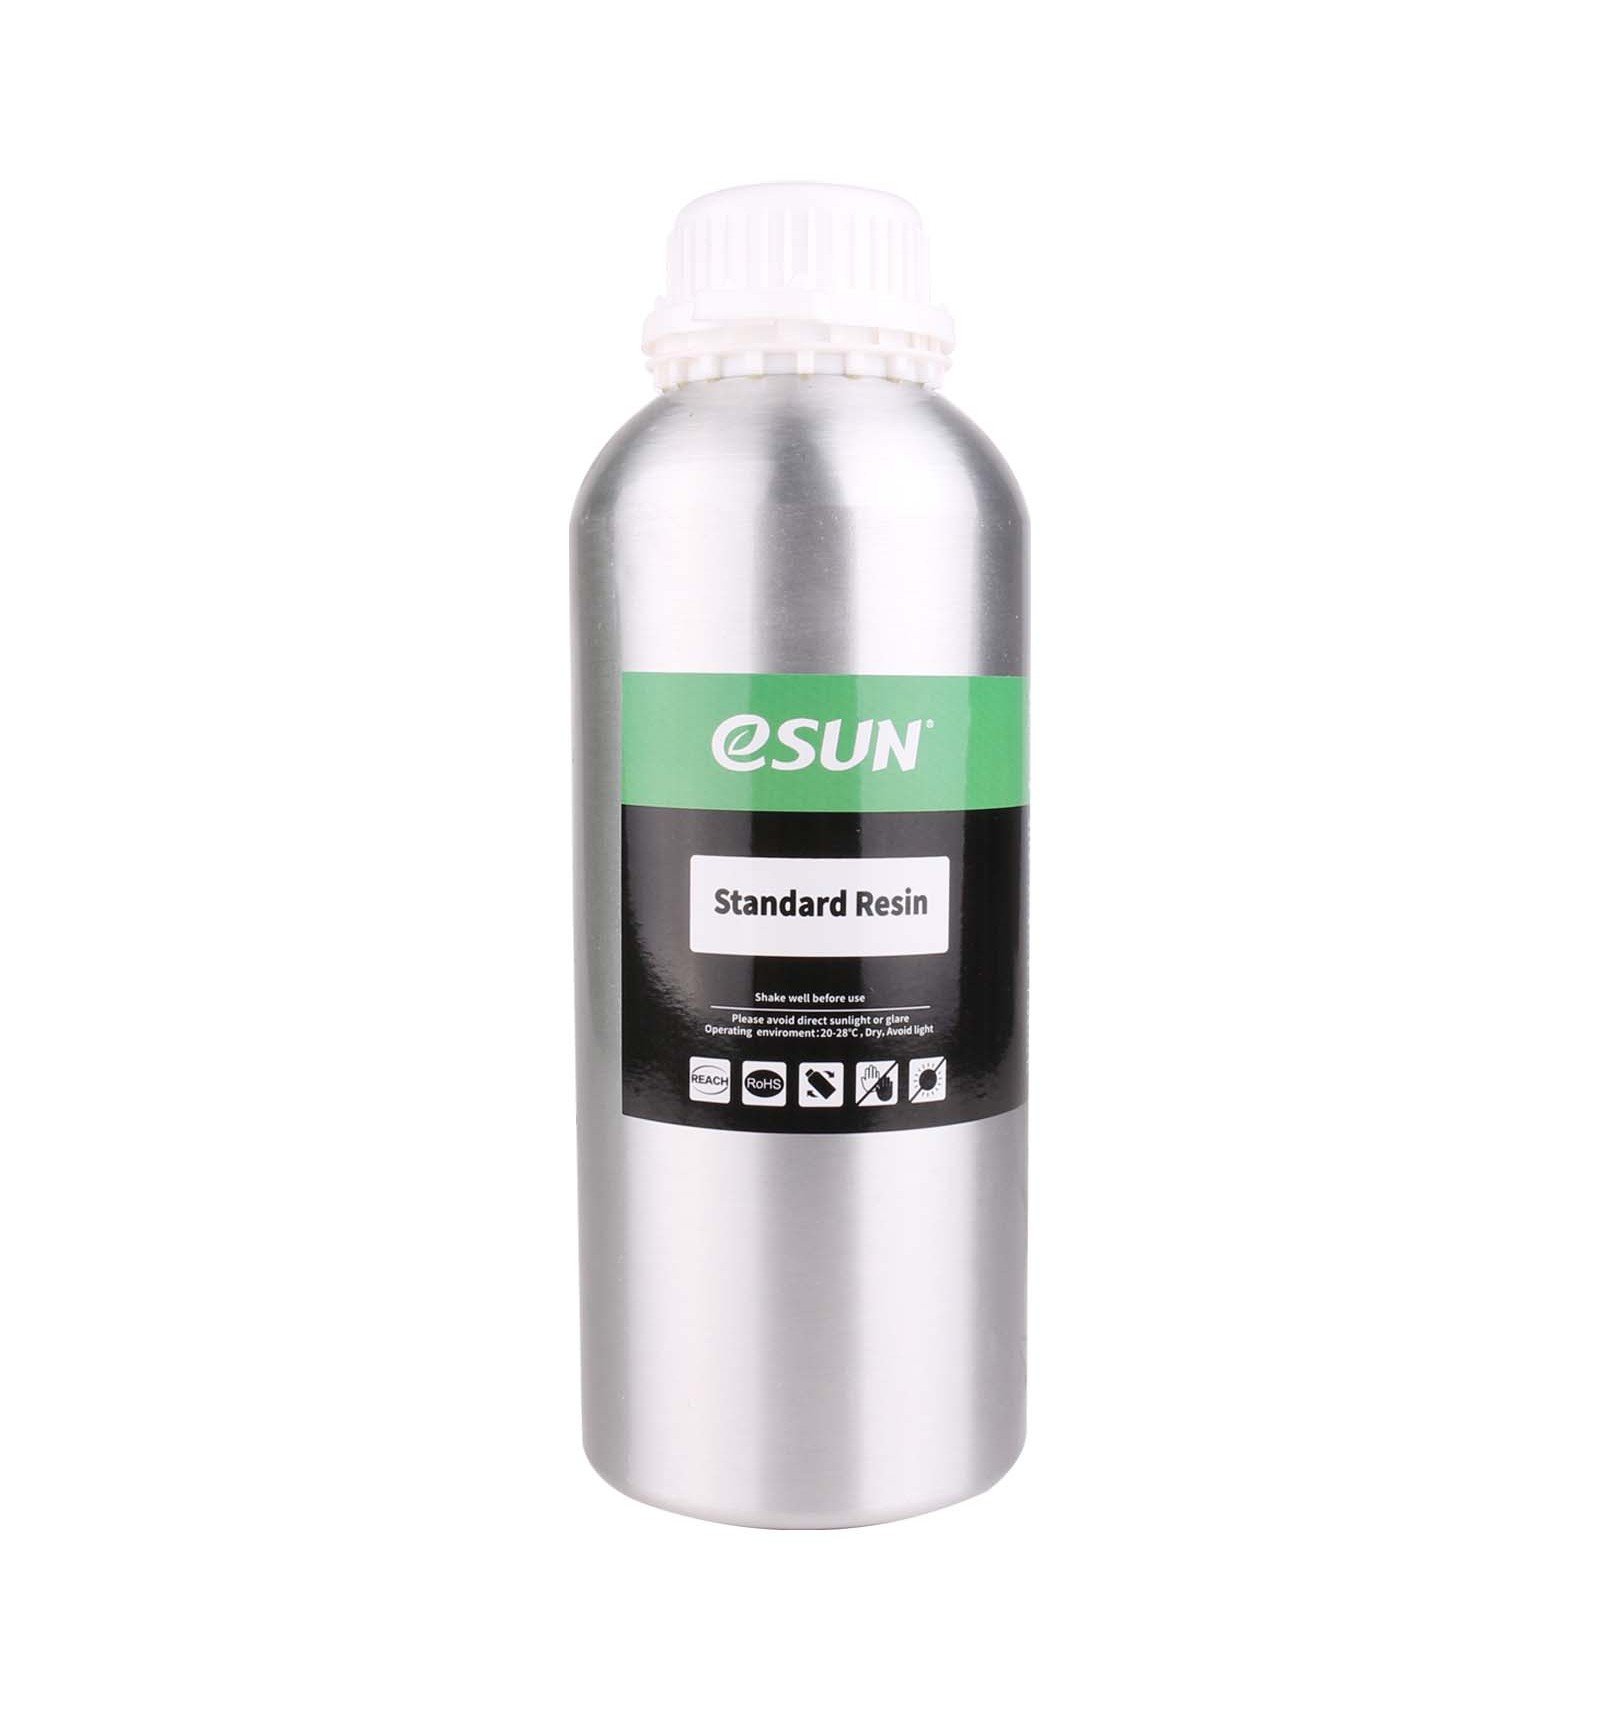 Esun Standard Resin (1KG)